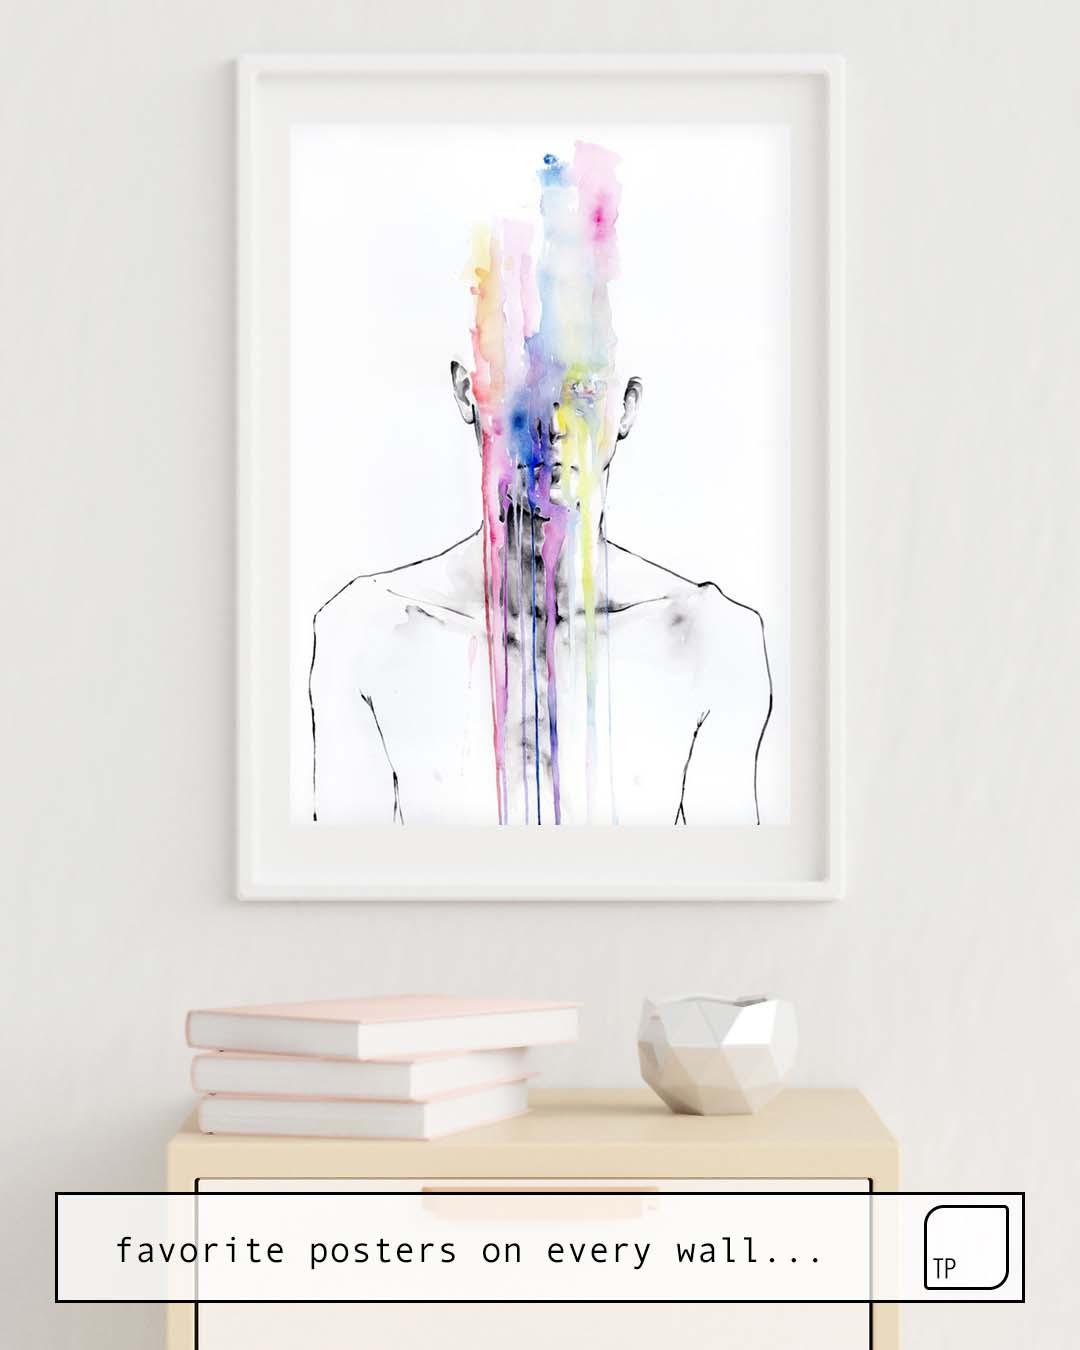 Affiche | ALL MY ART IS ON YOU BUT YOU STILL DON'T HEAR ME par Agnes Cecile